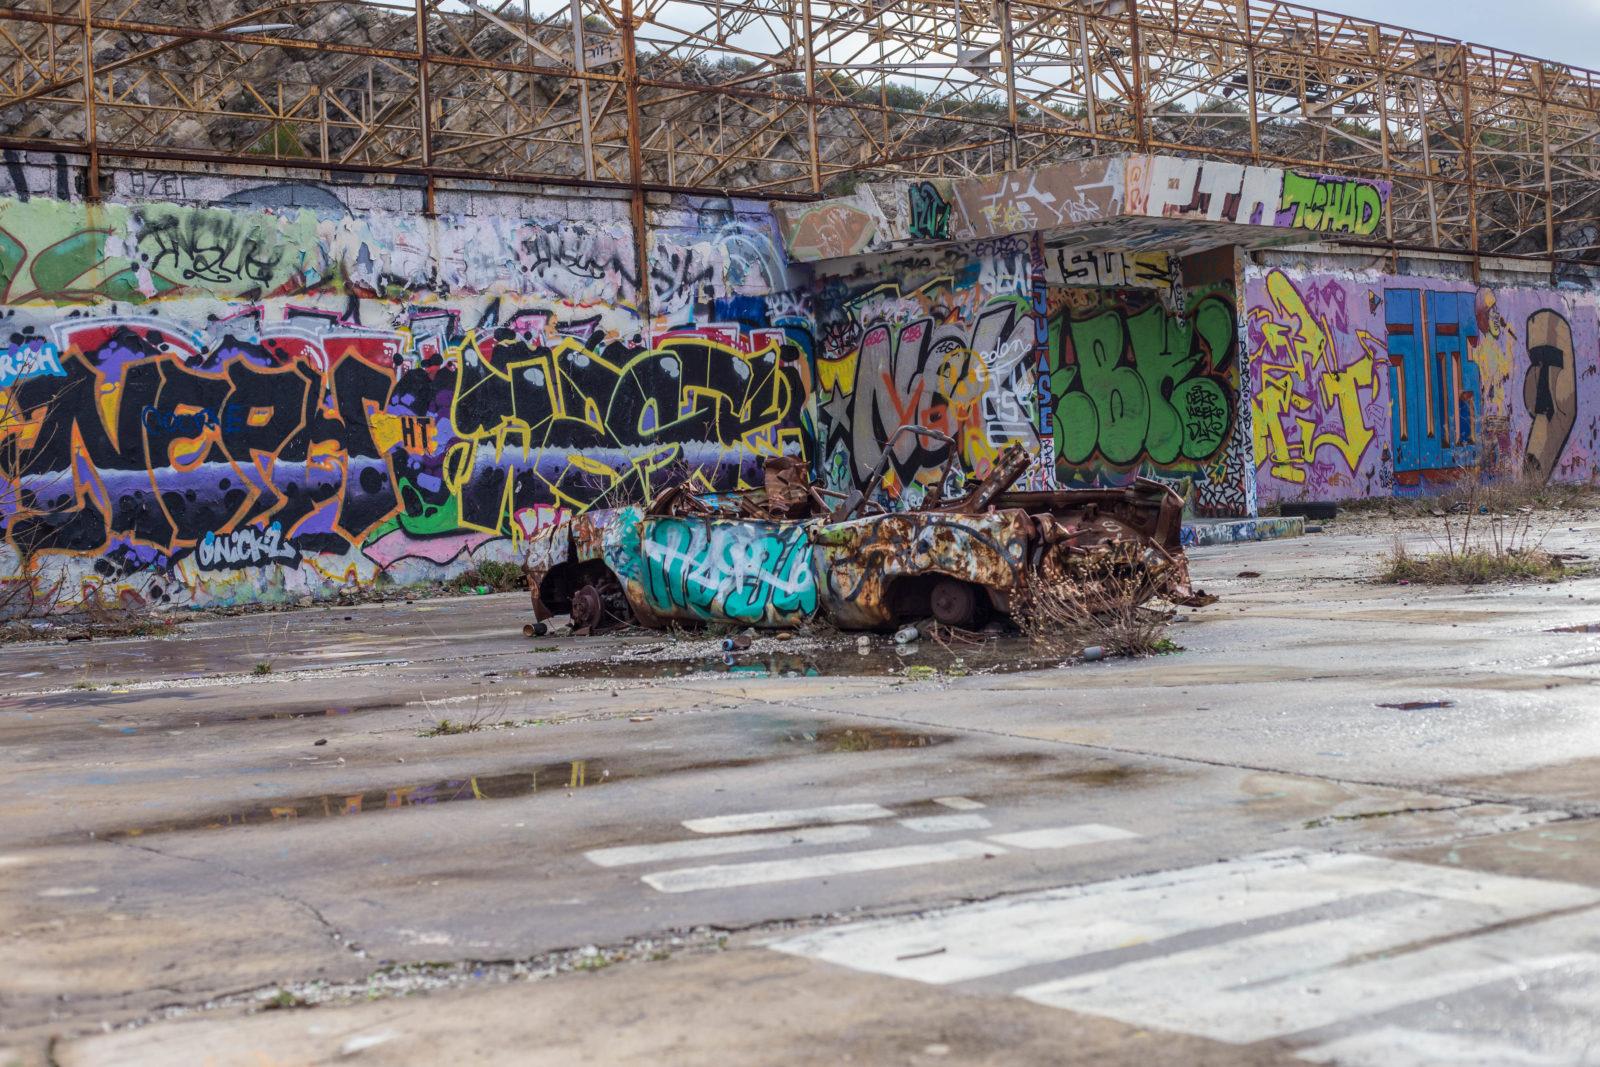 urbex jeanpantaleo skate Marseille LaCaverne tags graffitiIMG7058 - Des tricks et du freestyle avec Jean Pantaleo dans un skatepark 100% DIY